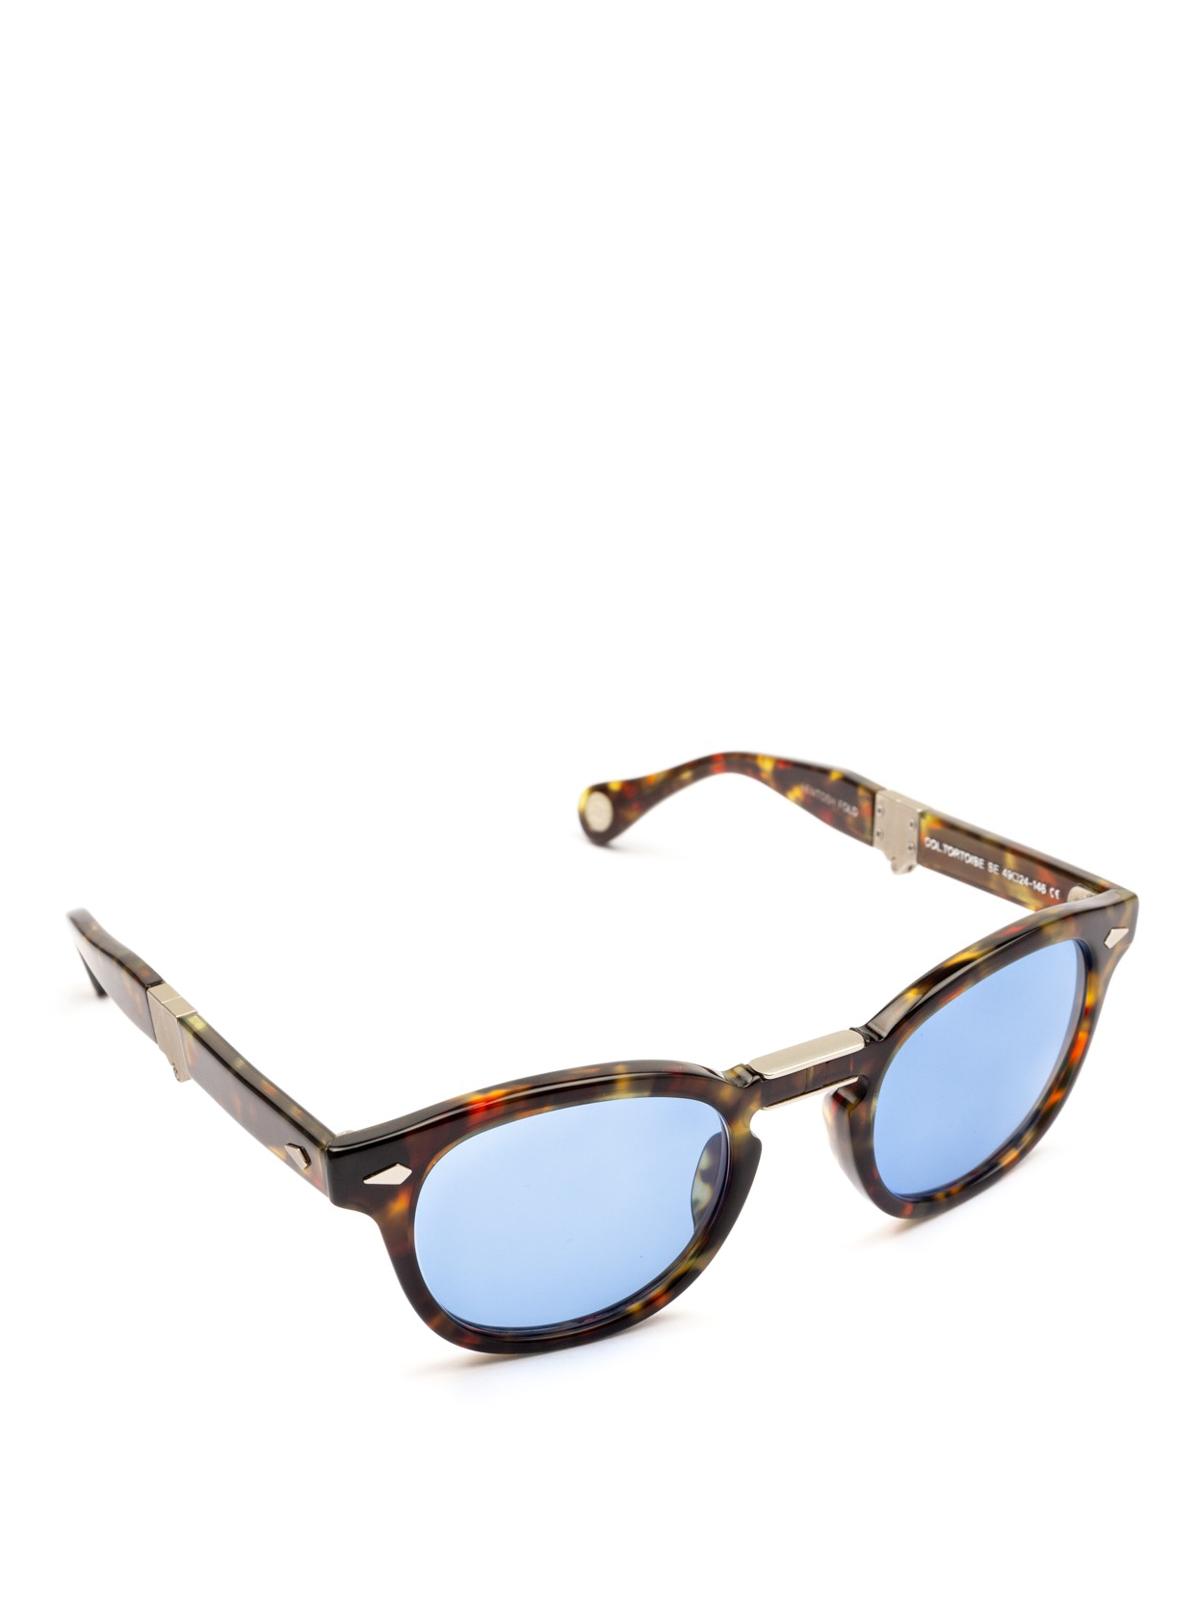 6c8d9d7f58 Moscot - Lemtosh Fold blue lens tortoise sunglasses - sunglasses ...